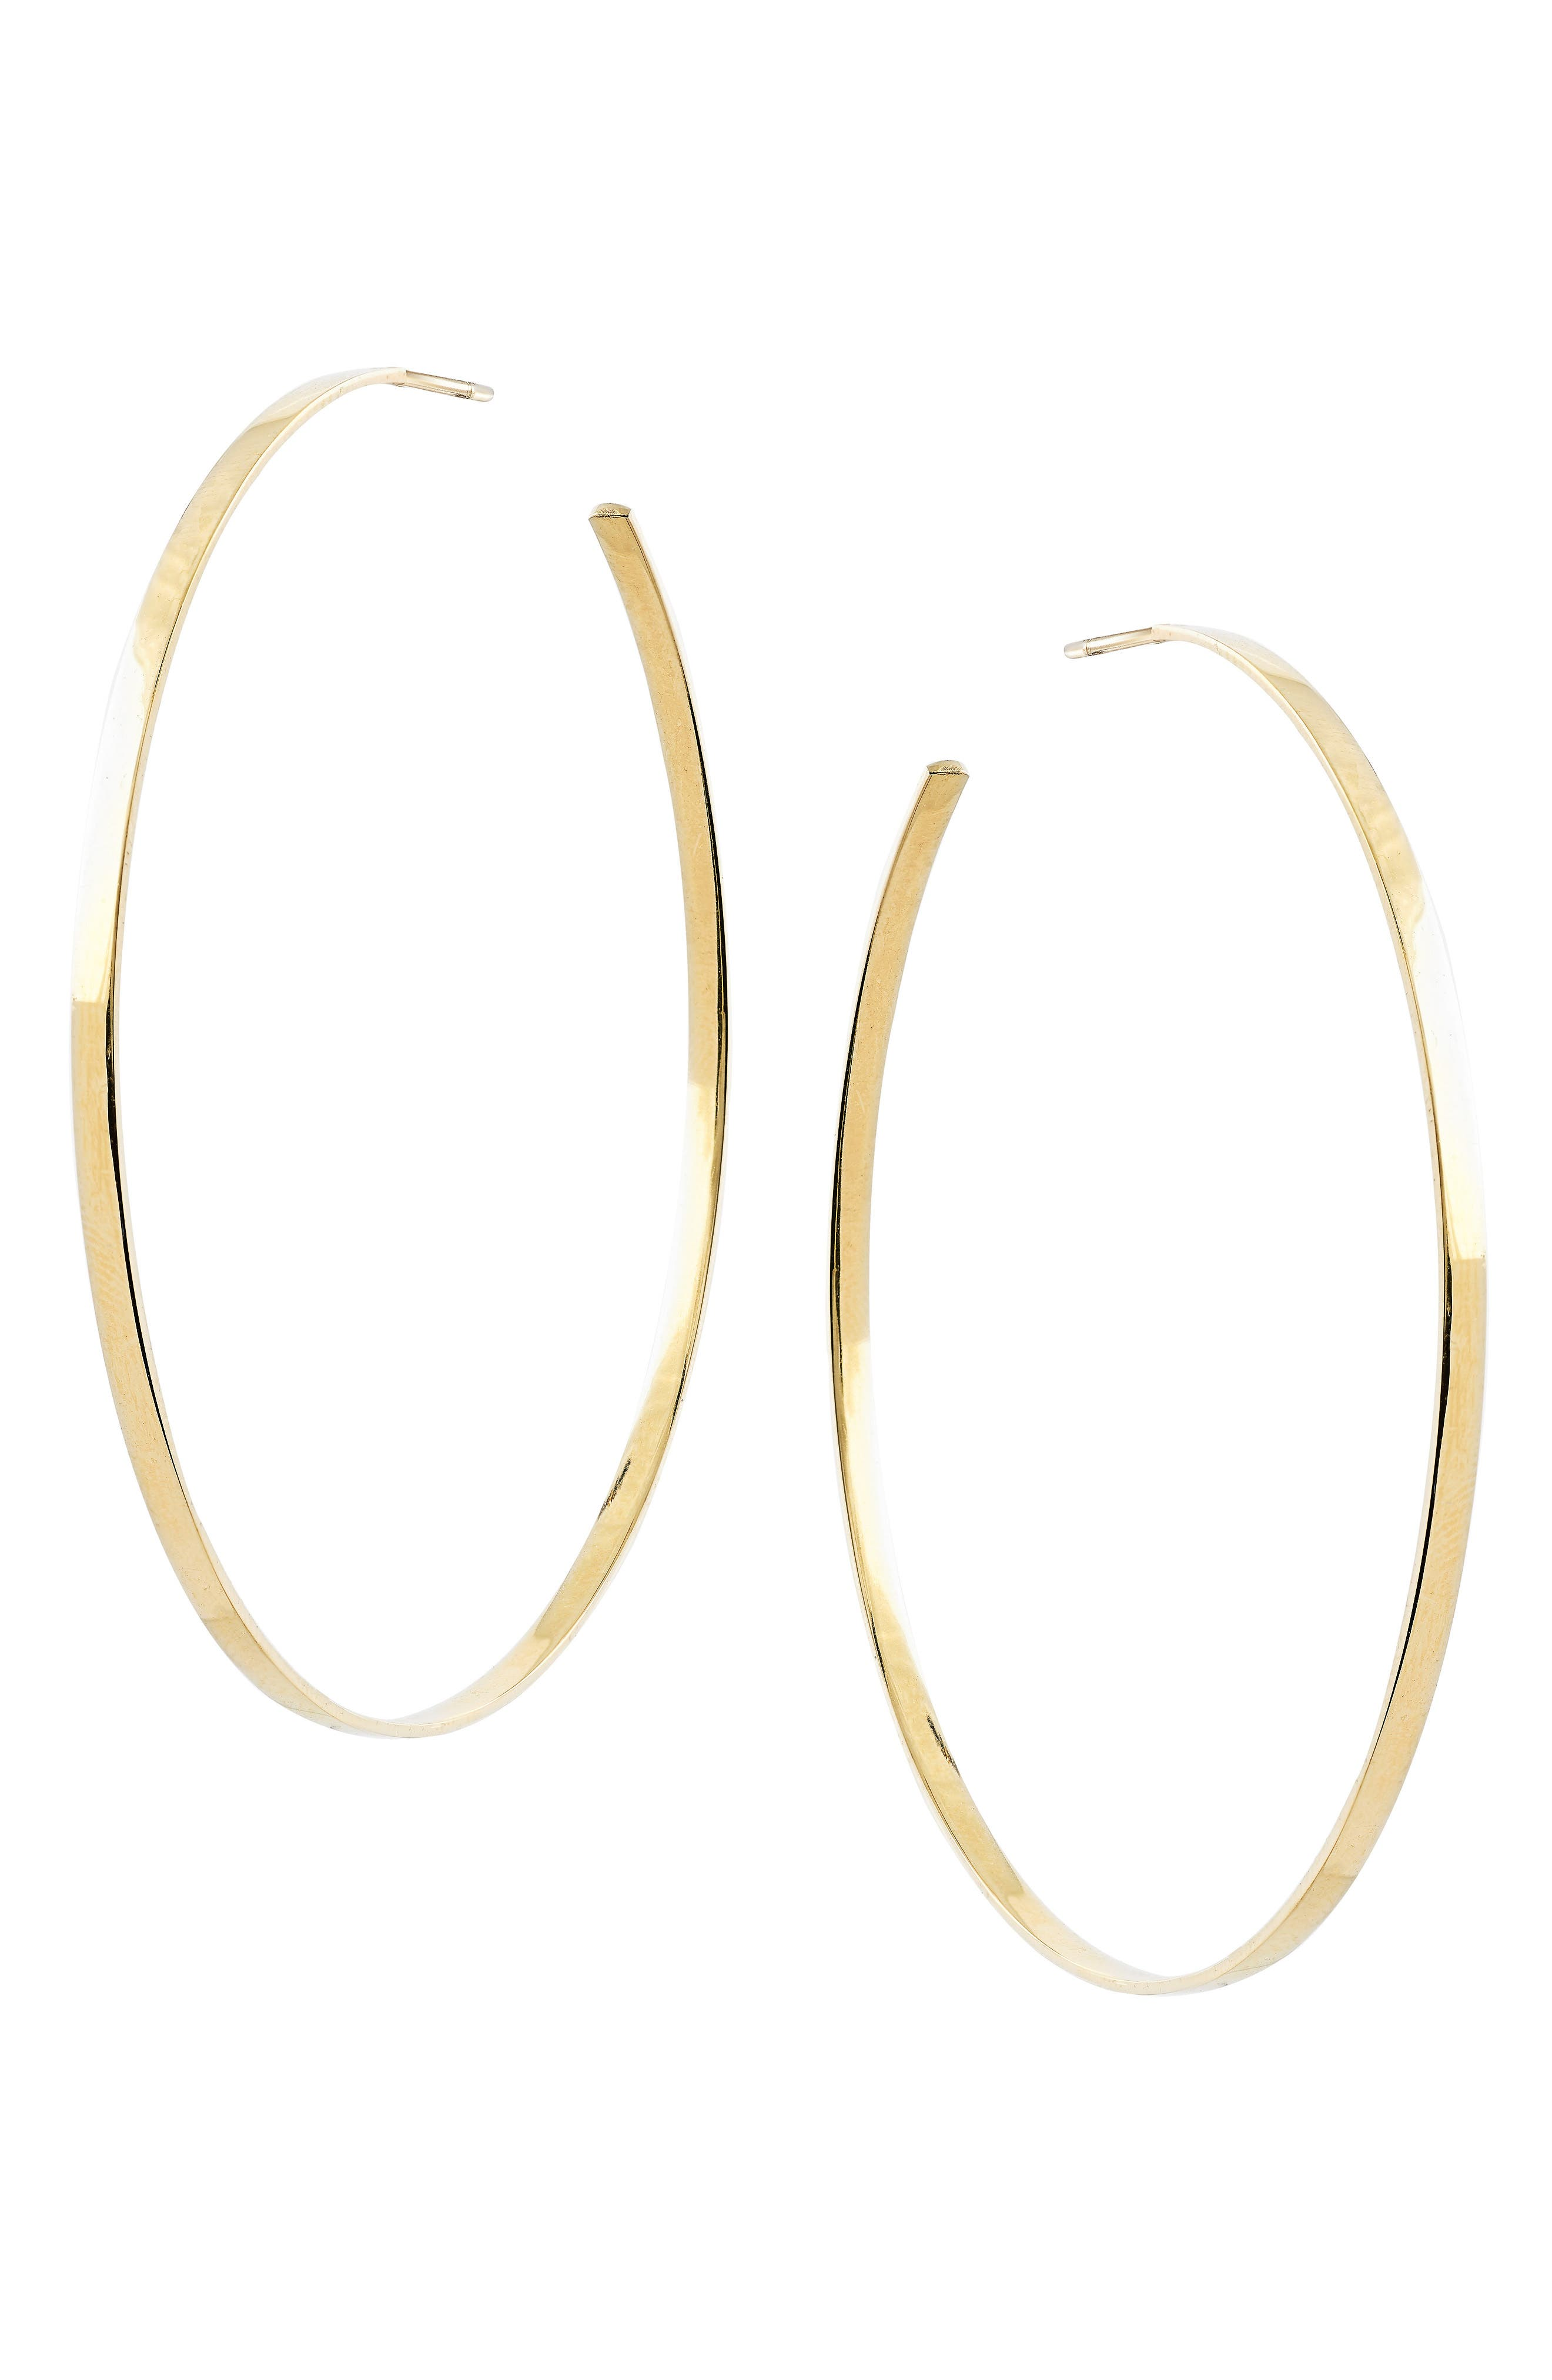 Sunrise Hoop Earrings,                             Main thumbnail 1, color,                             Yellow Gold